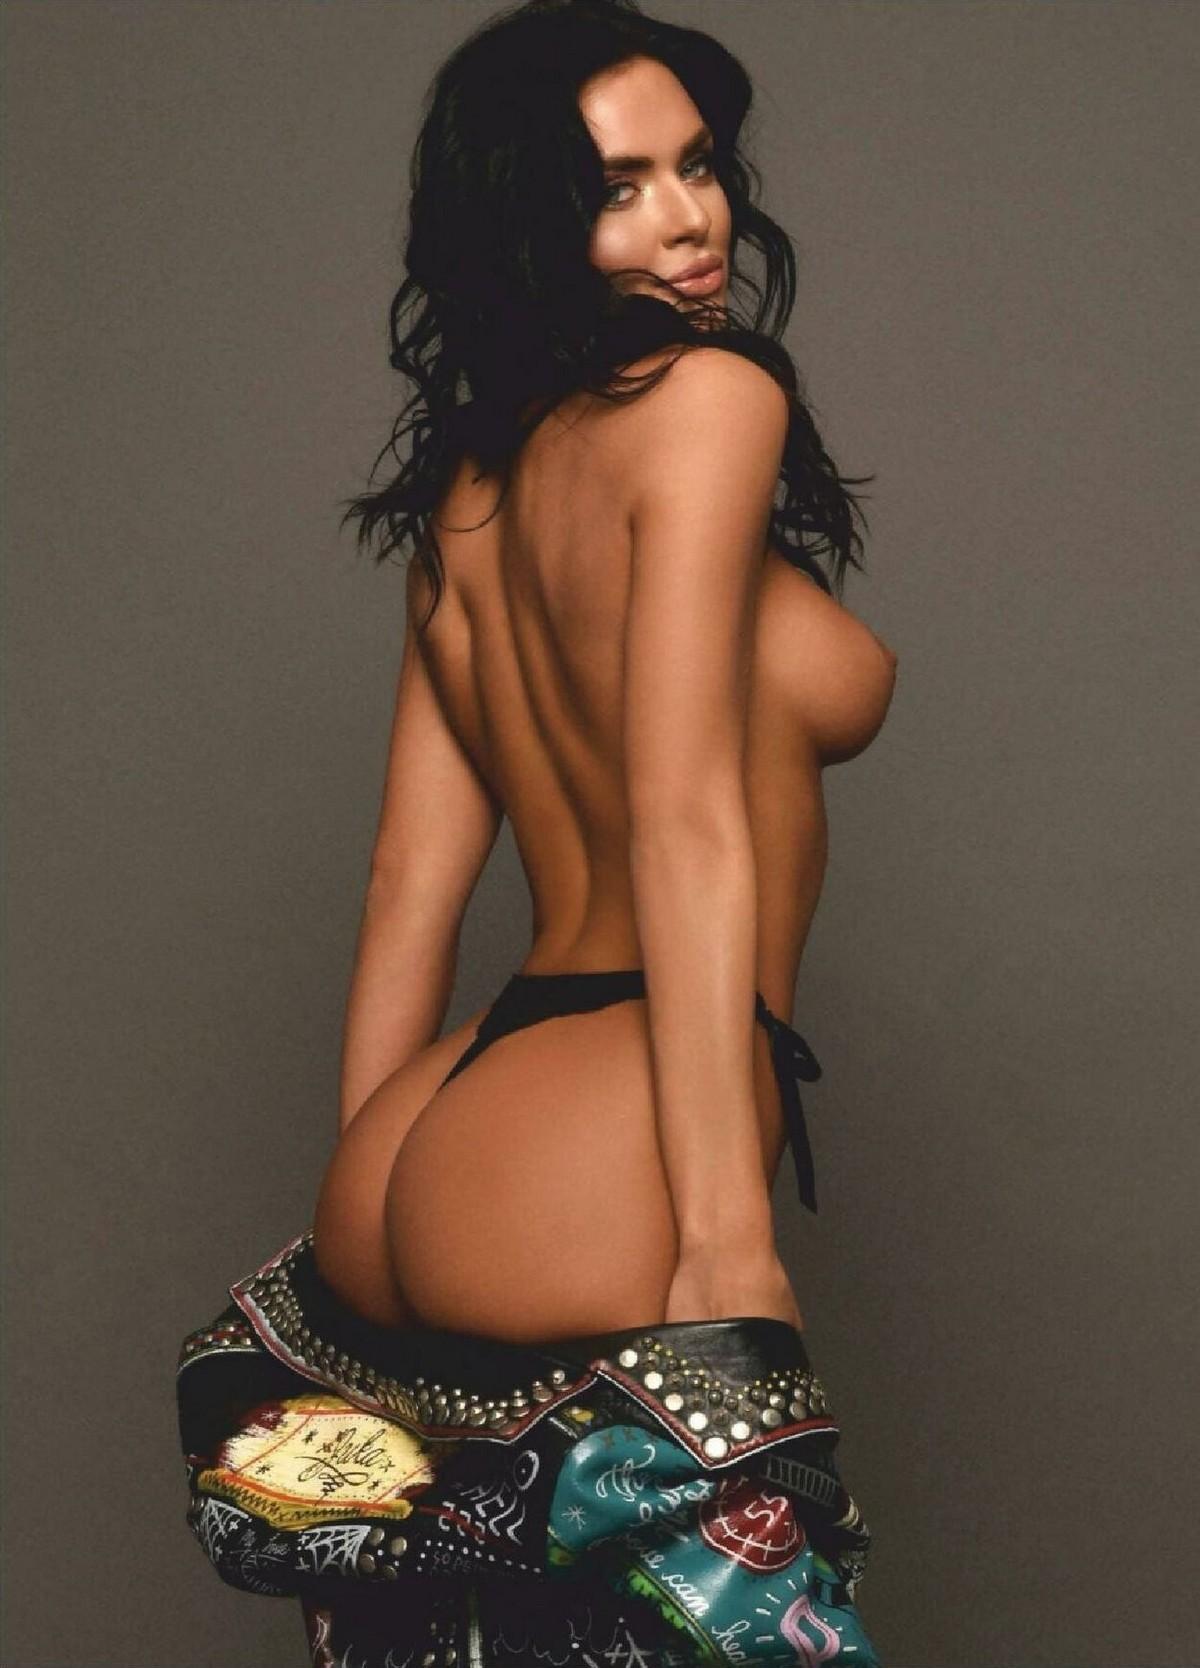 Kelsie Jean Smeby Naked